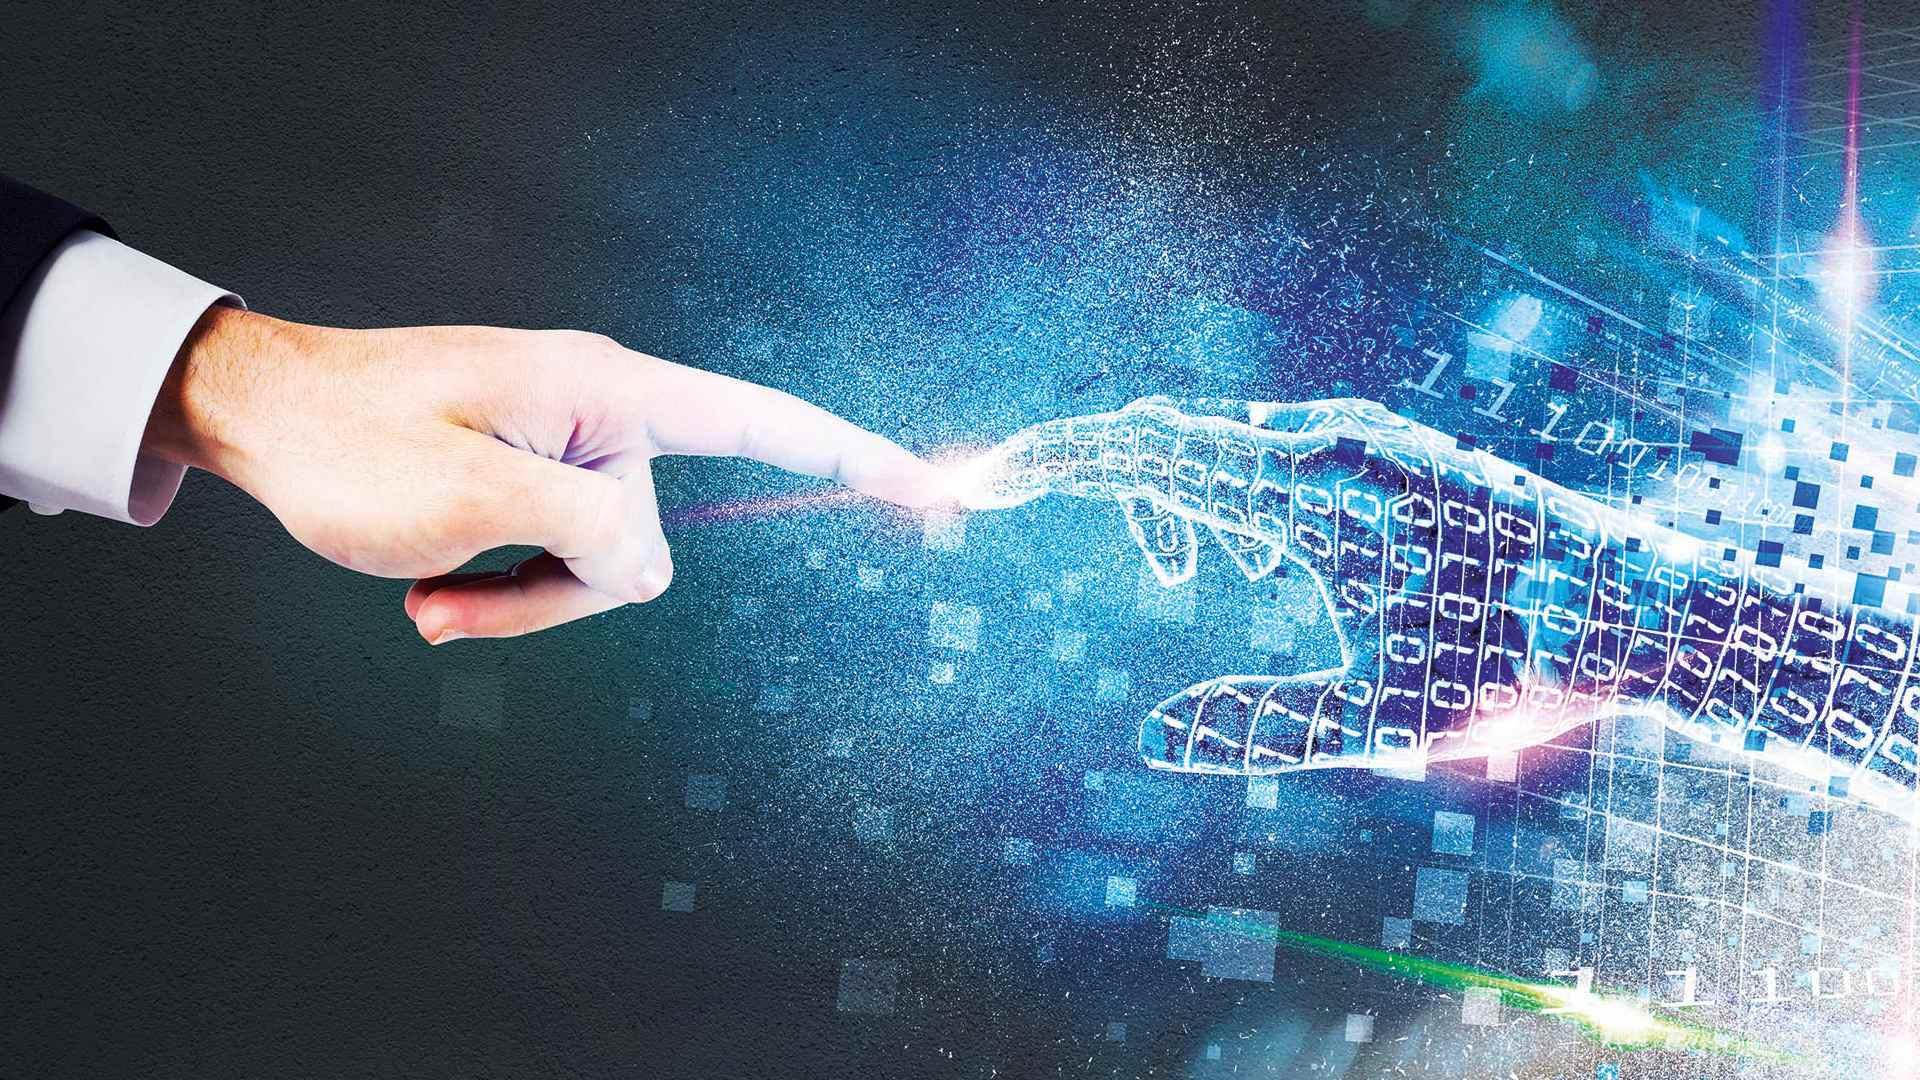 Hände digital Mensch